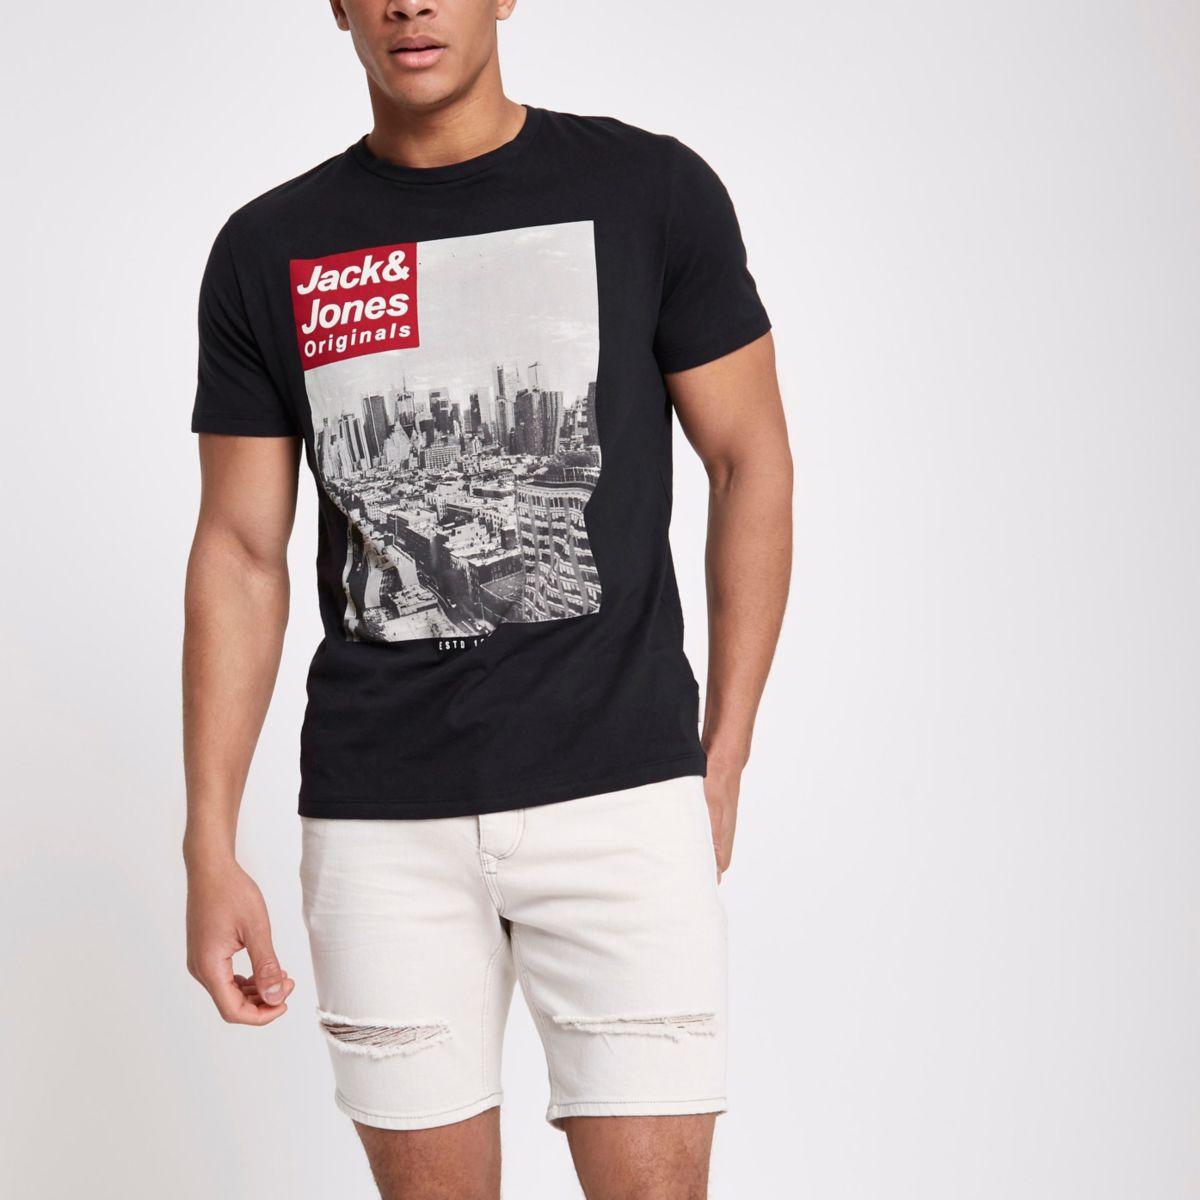 Jack & Jones Originals black photo T-shirt